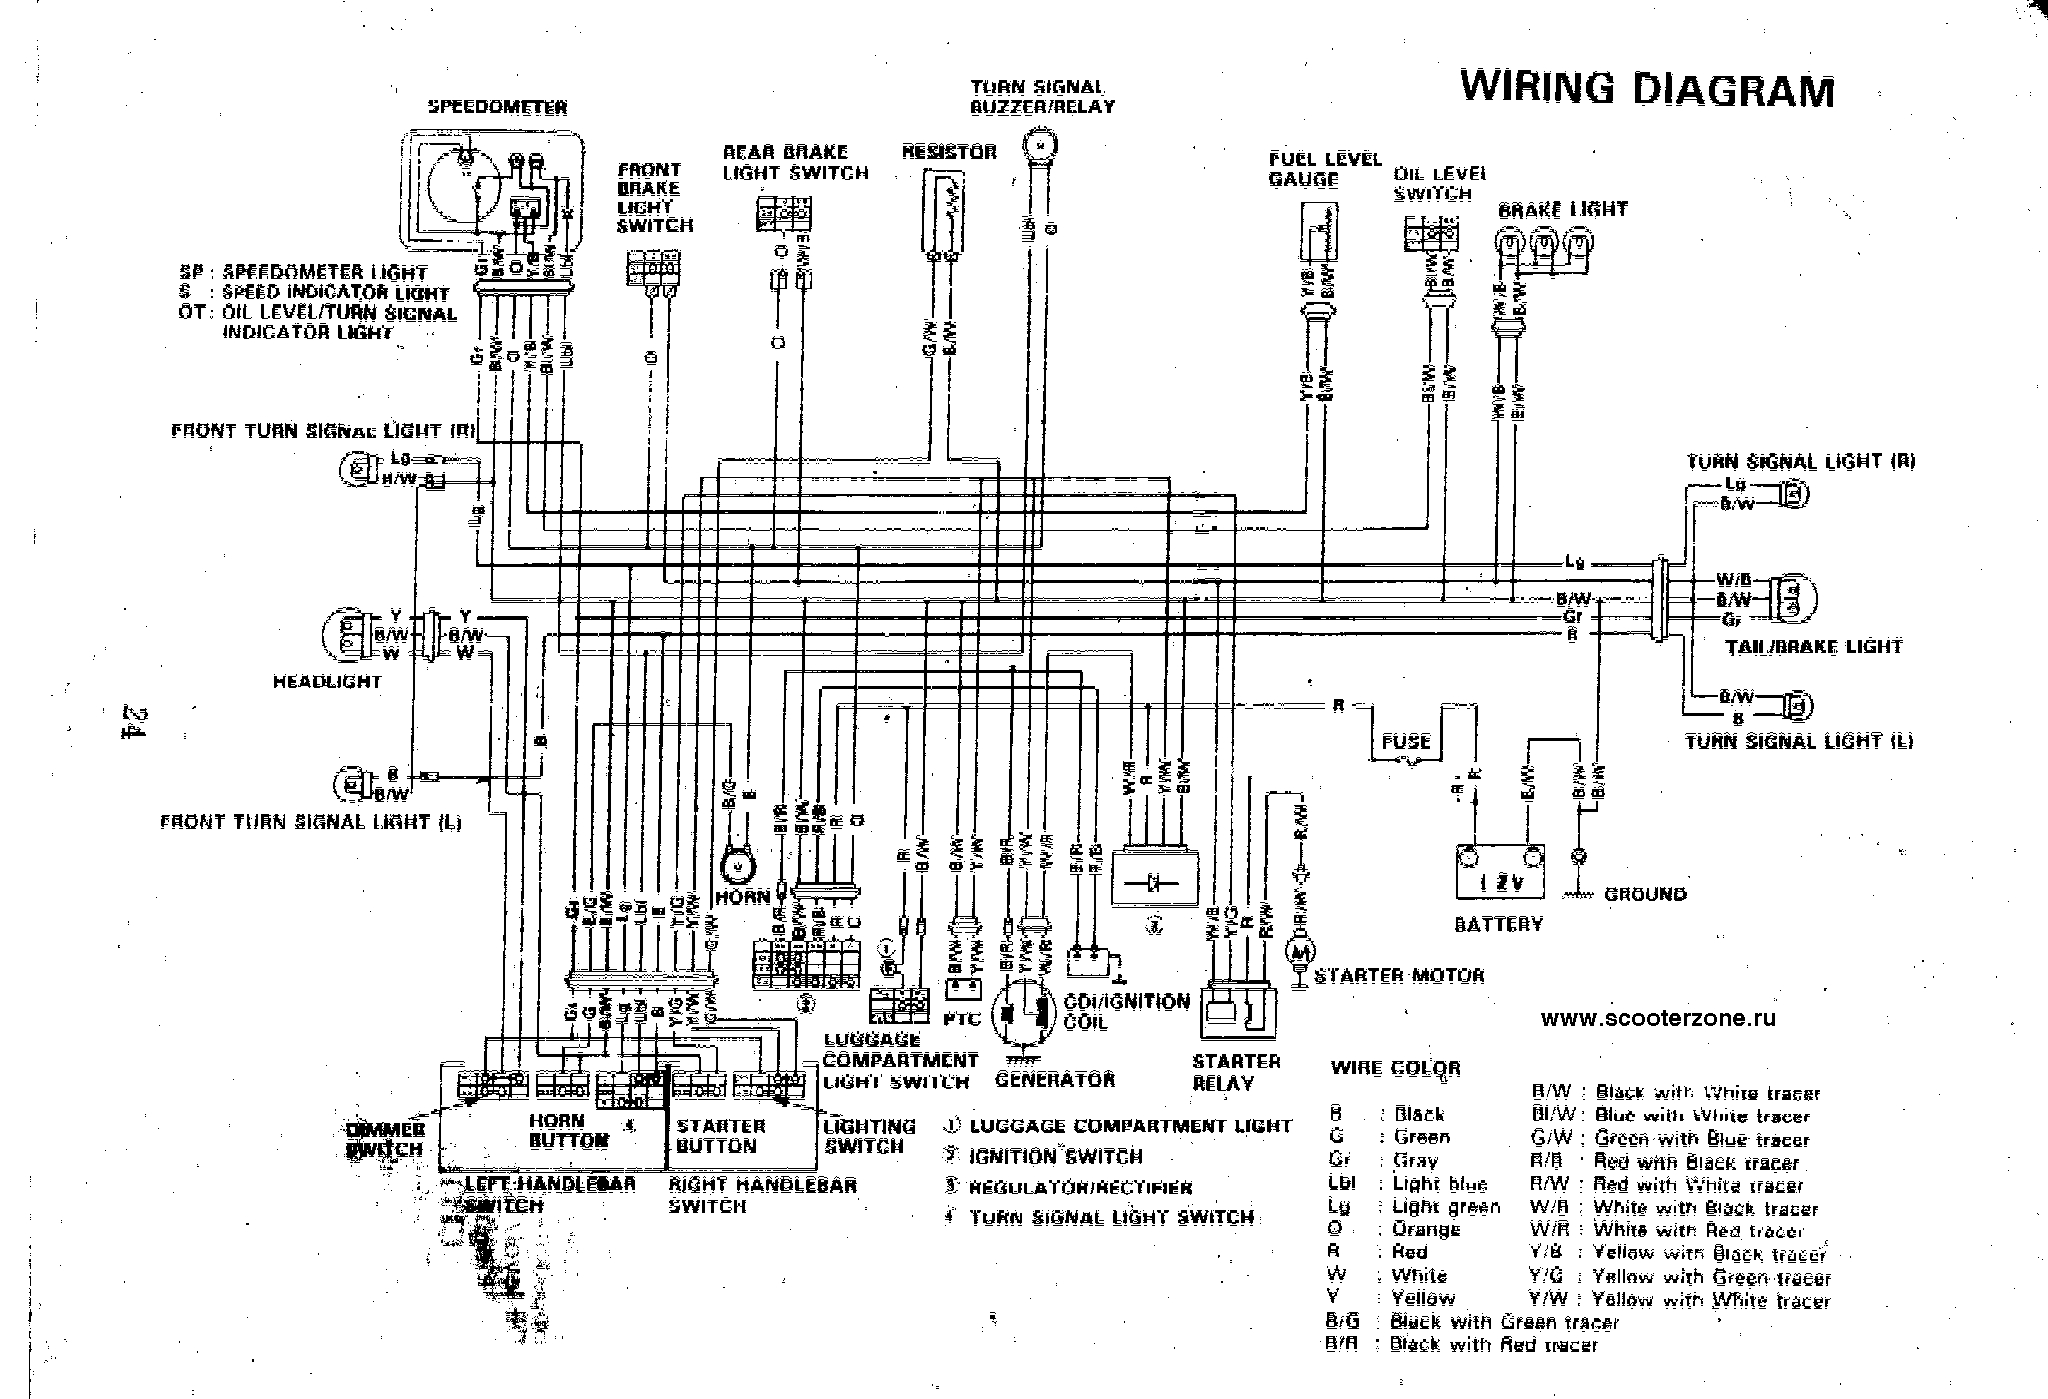 suzuki gs550 wiring diagram gs400 grey water septic tank diagram, Wiring diagram